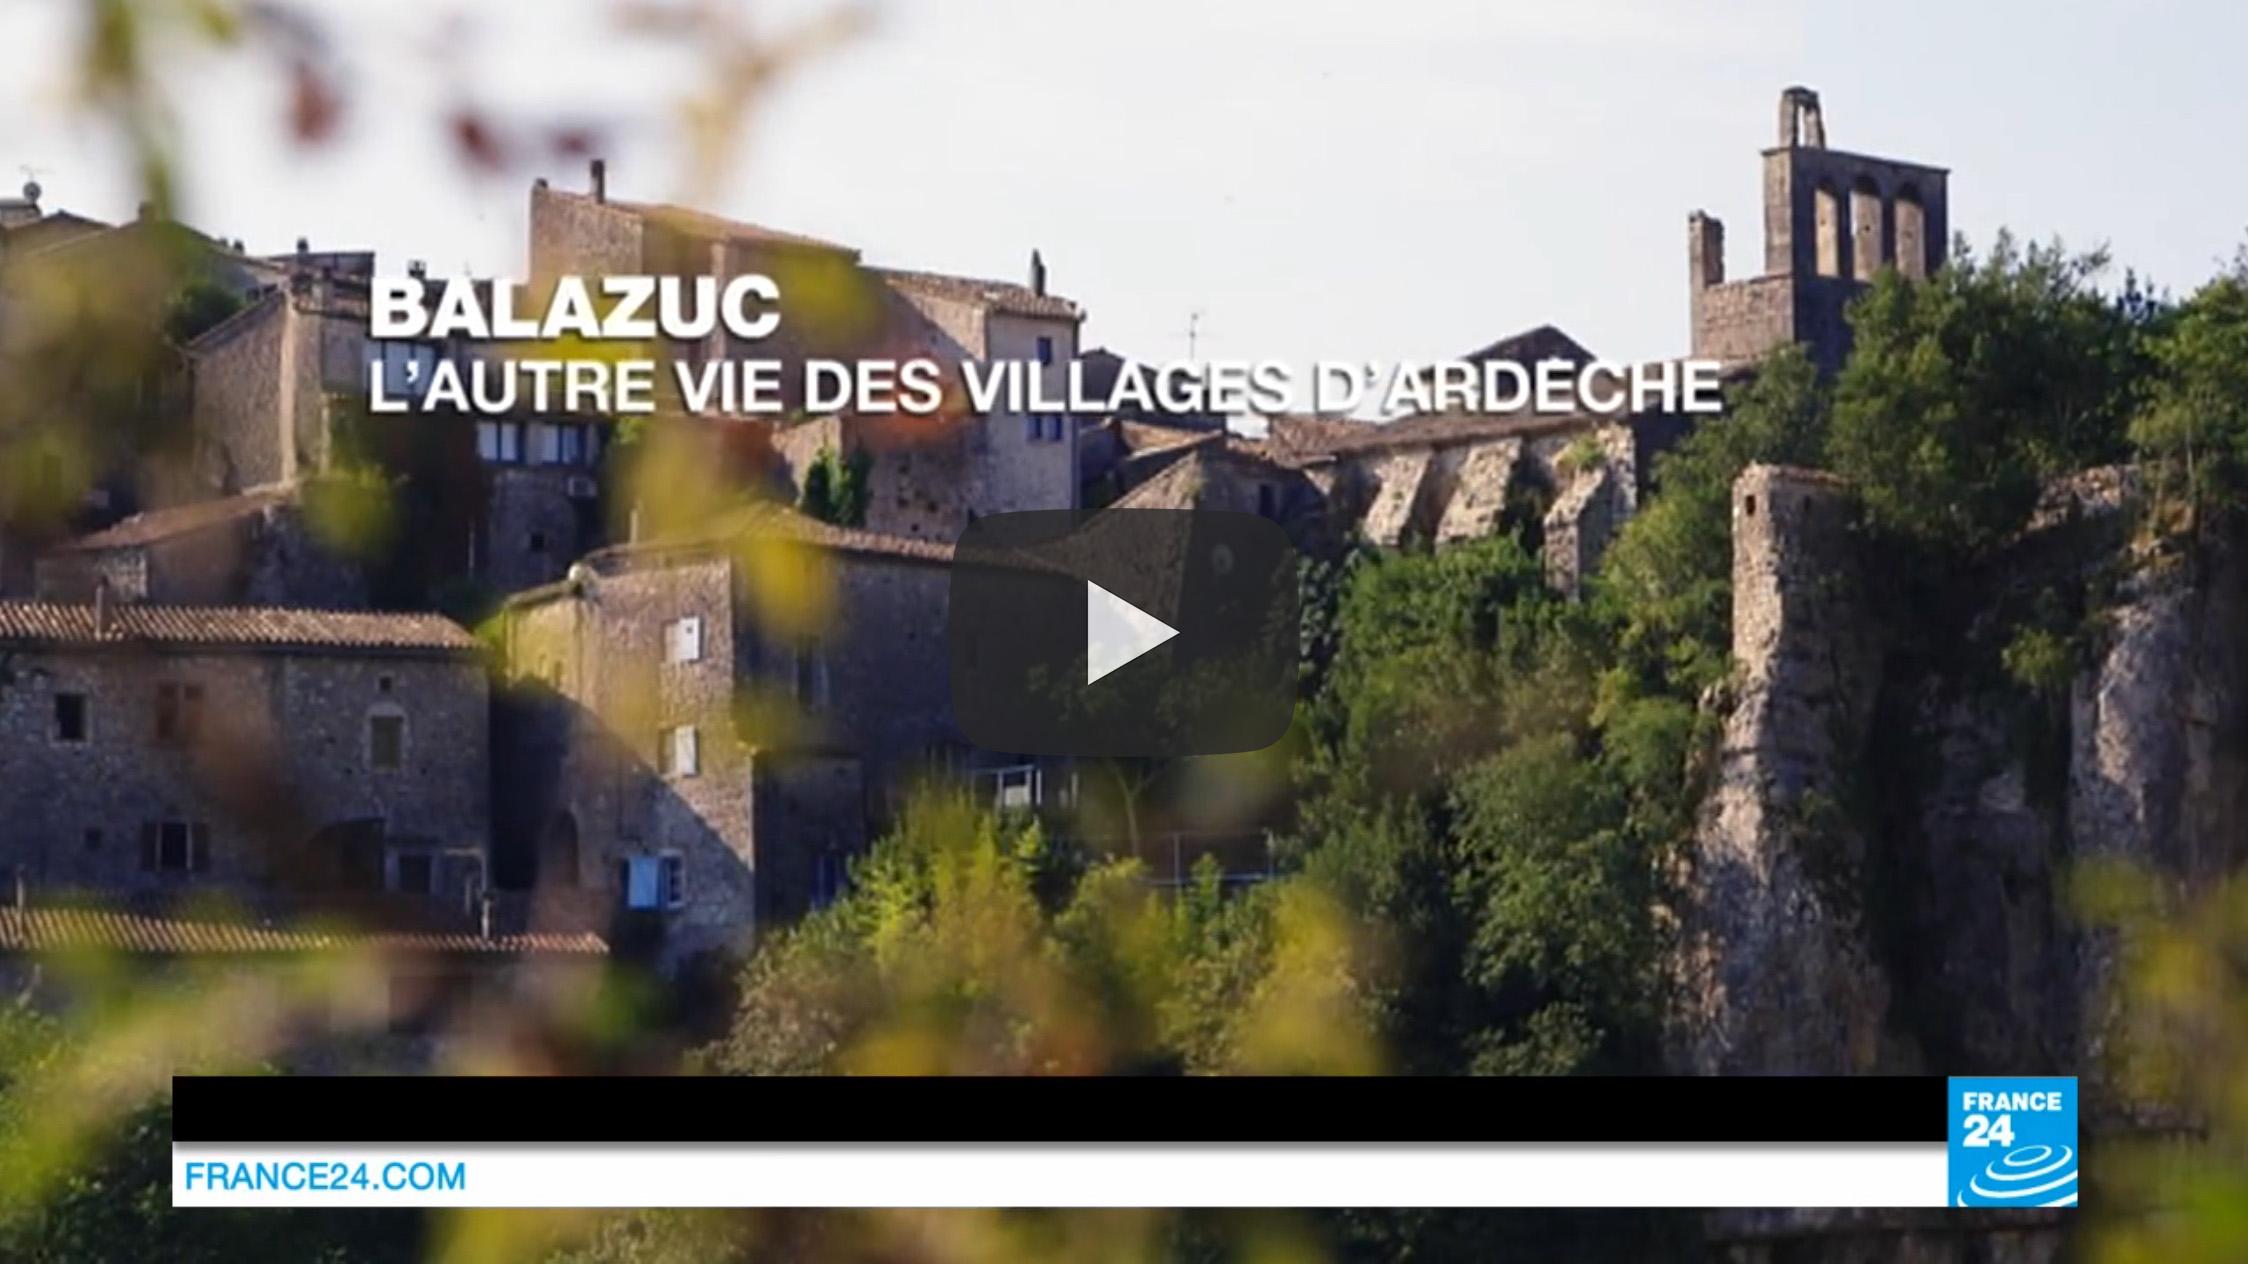 180 Balazuc Ardèche gîte charme vue panoramique jacuzzi reportage documentaire